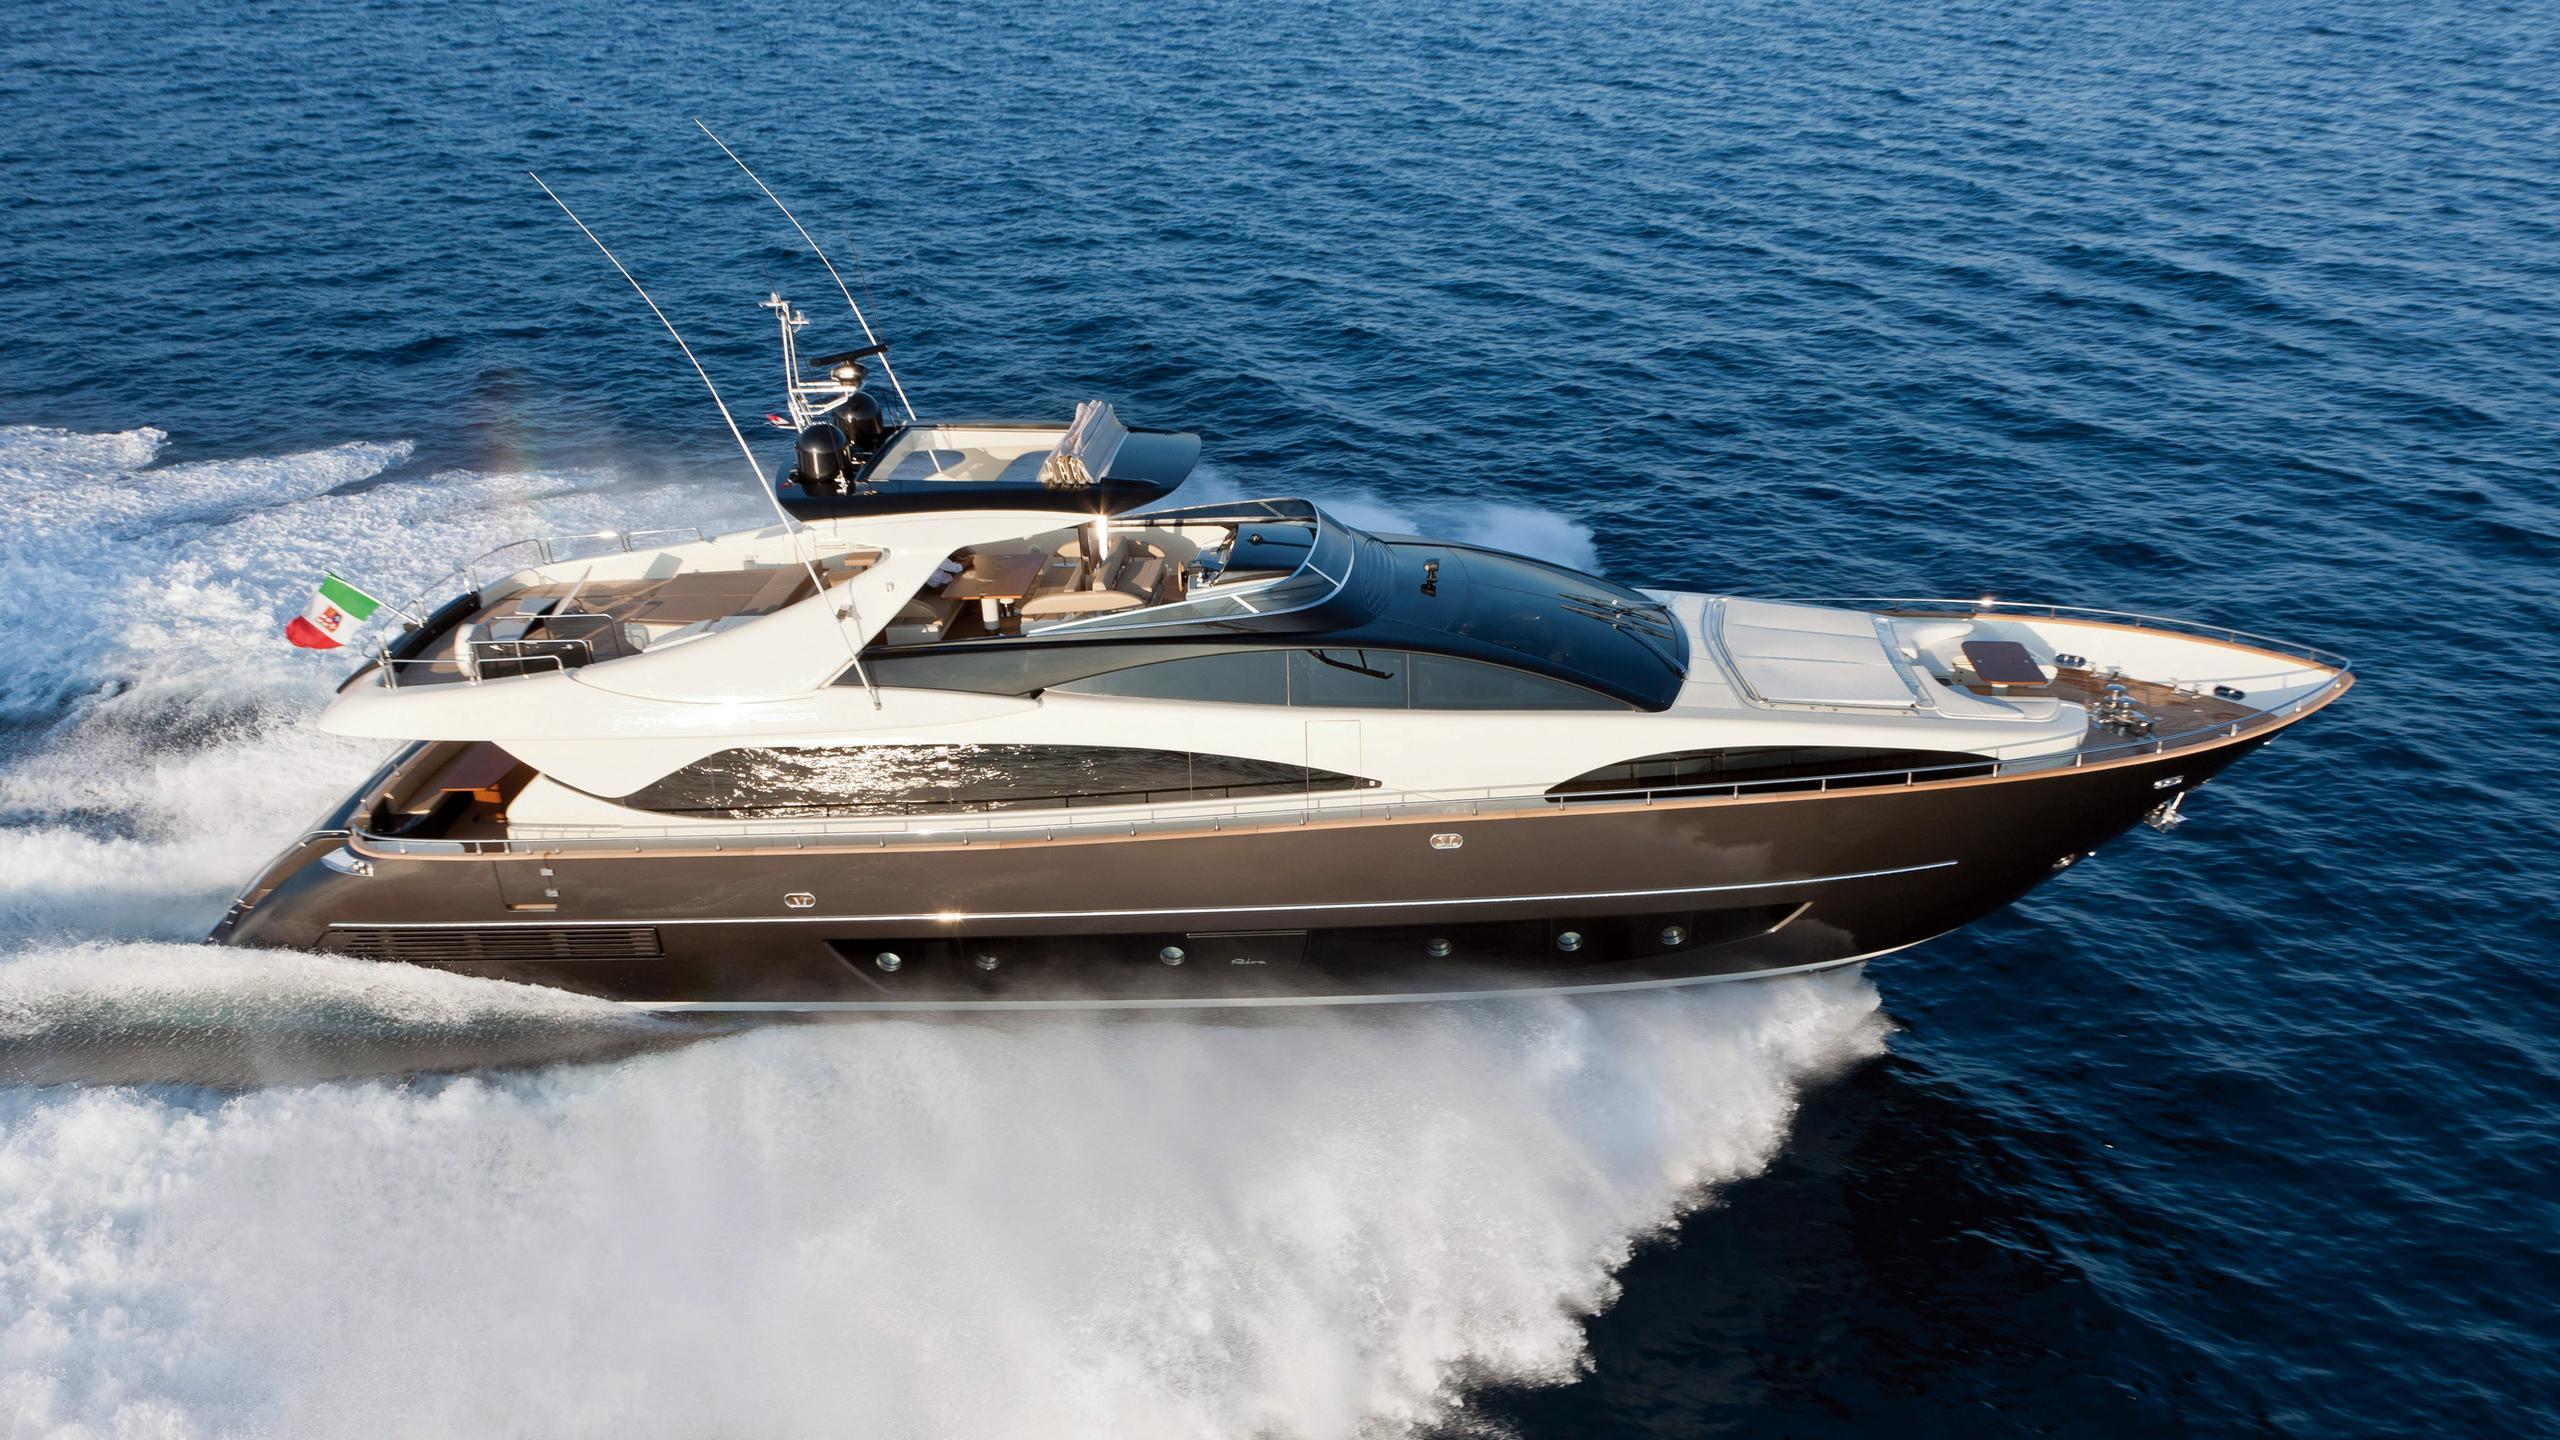 cobana kalunga ii motoryacht riva duchessa 92 2009 28m profile sistership